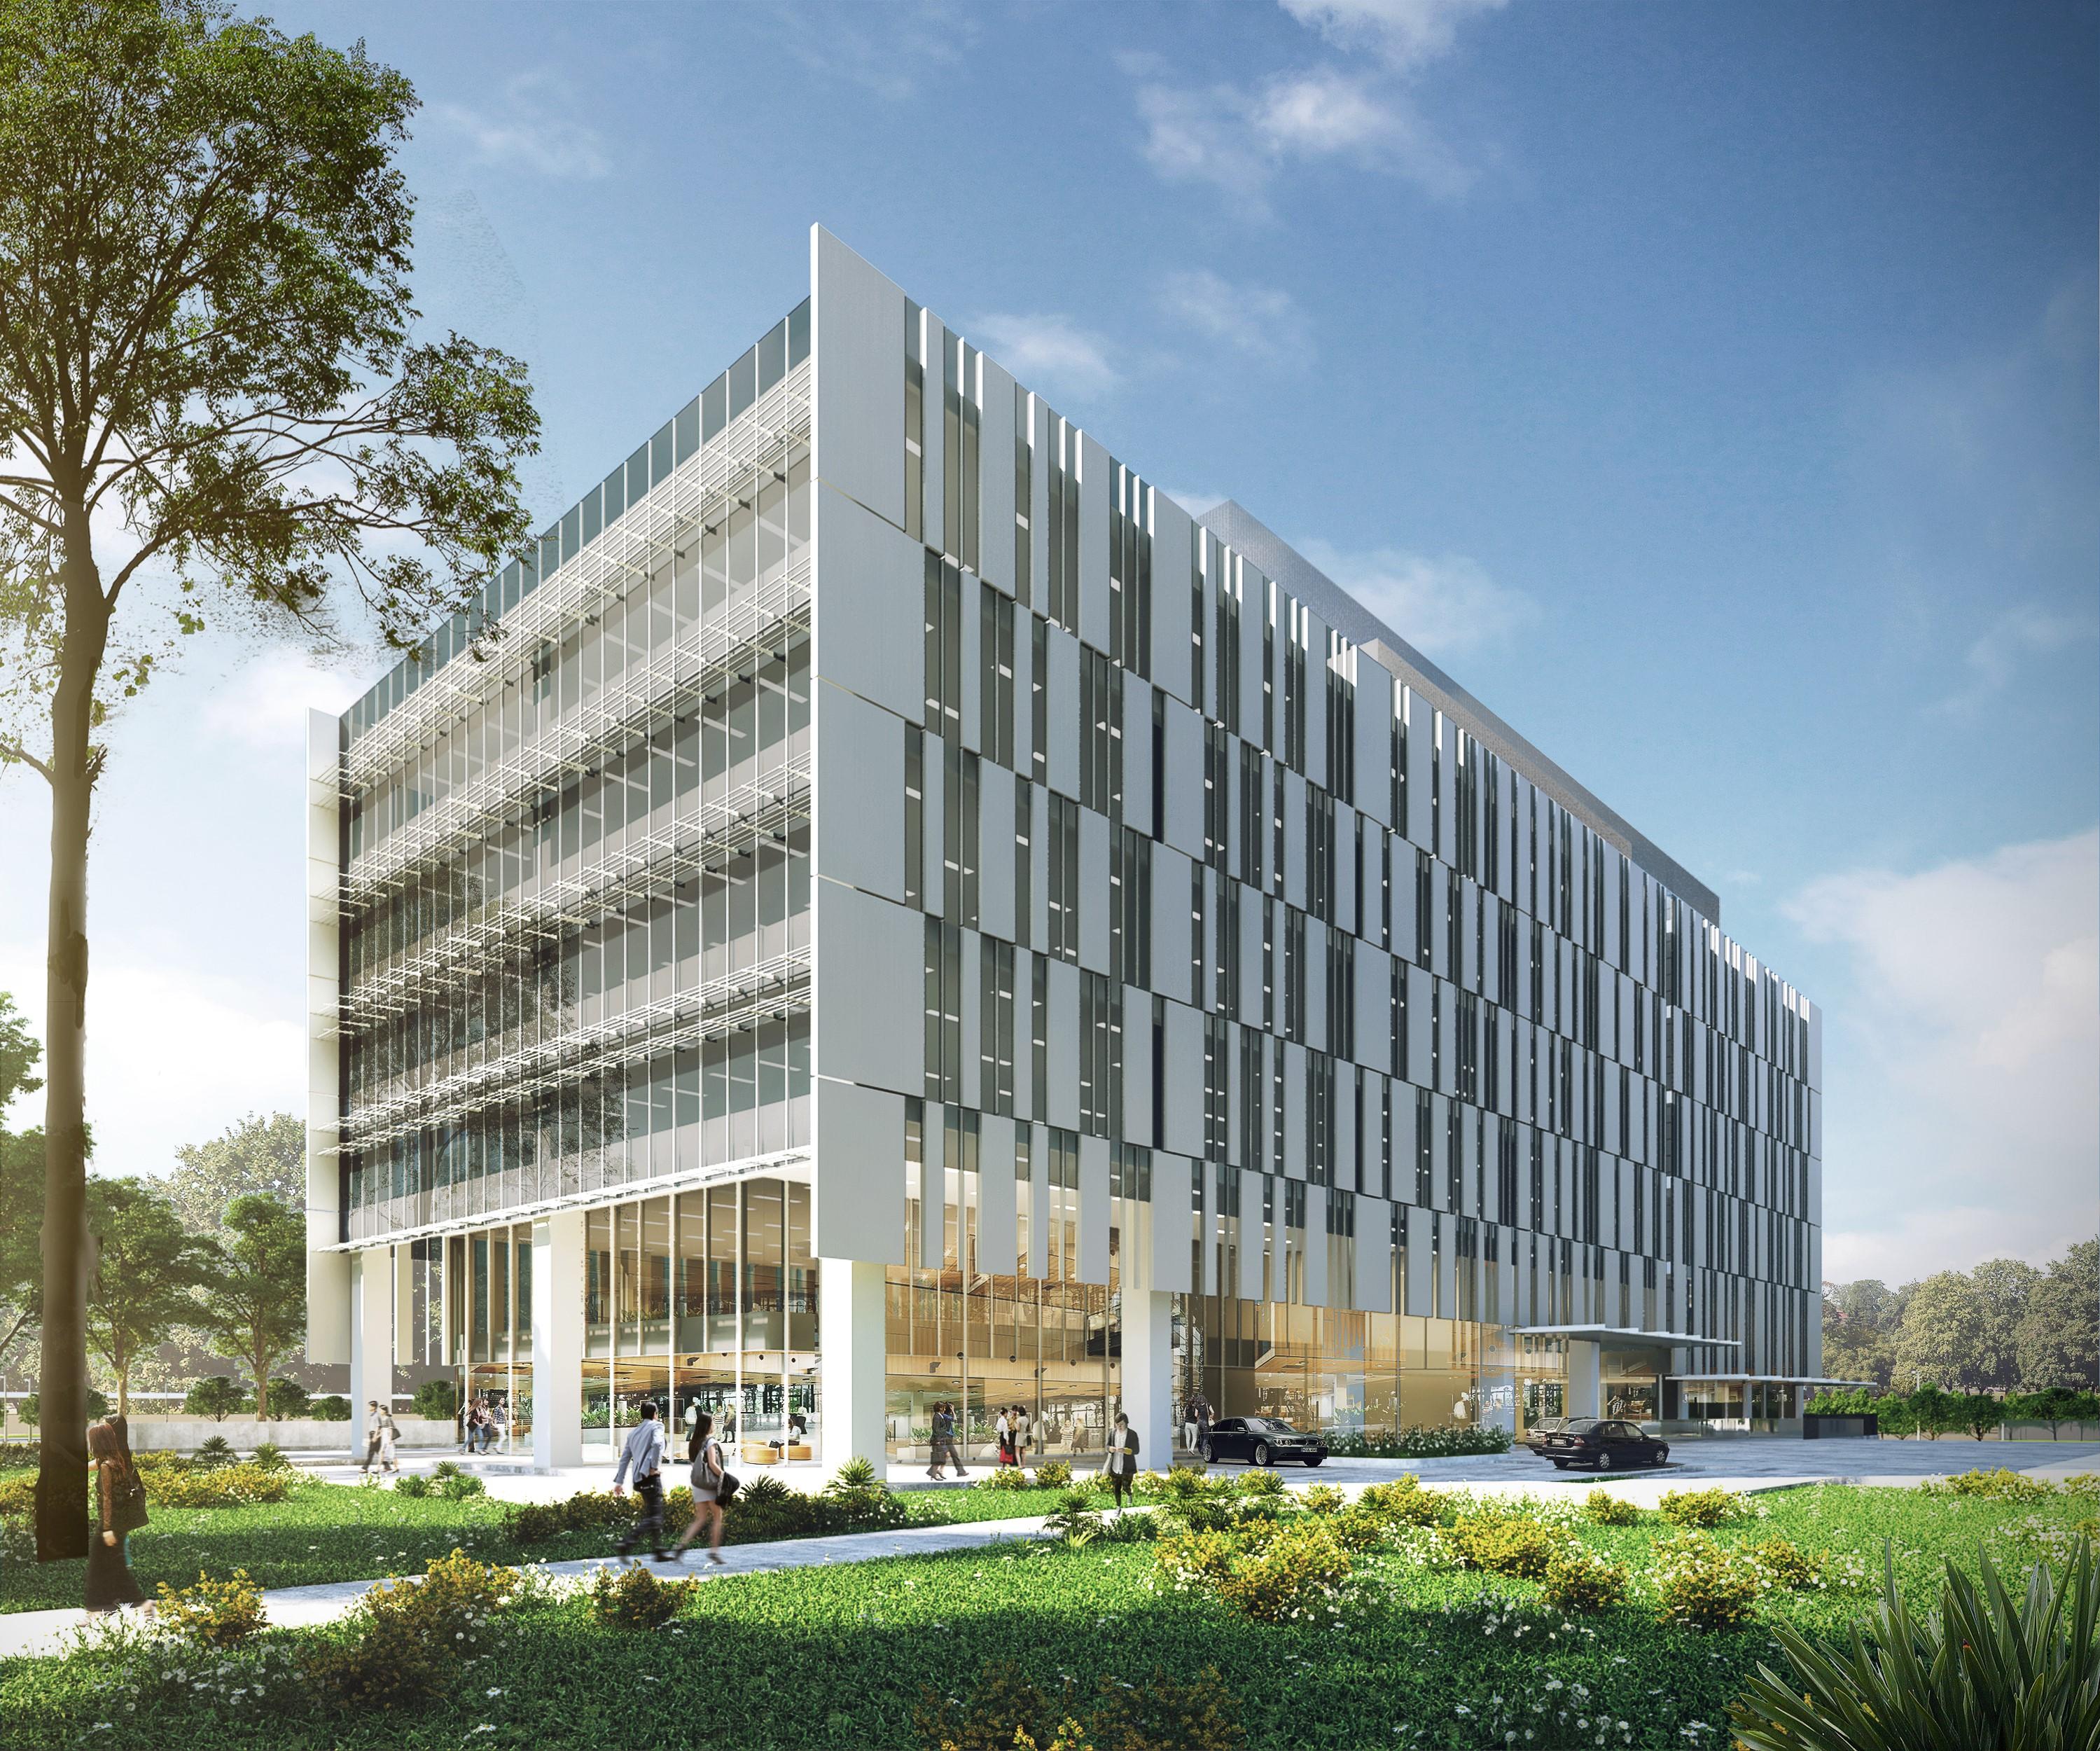 Office Tower 1 at OneHub Saigon starts construction